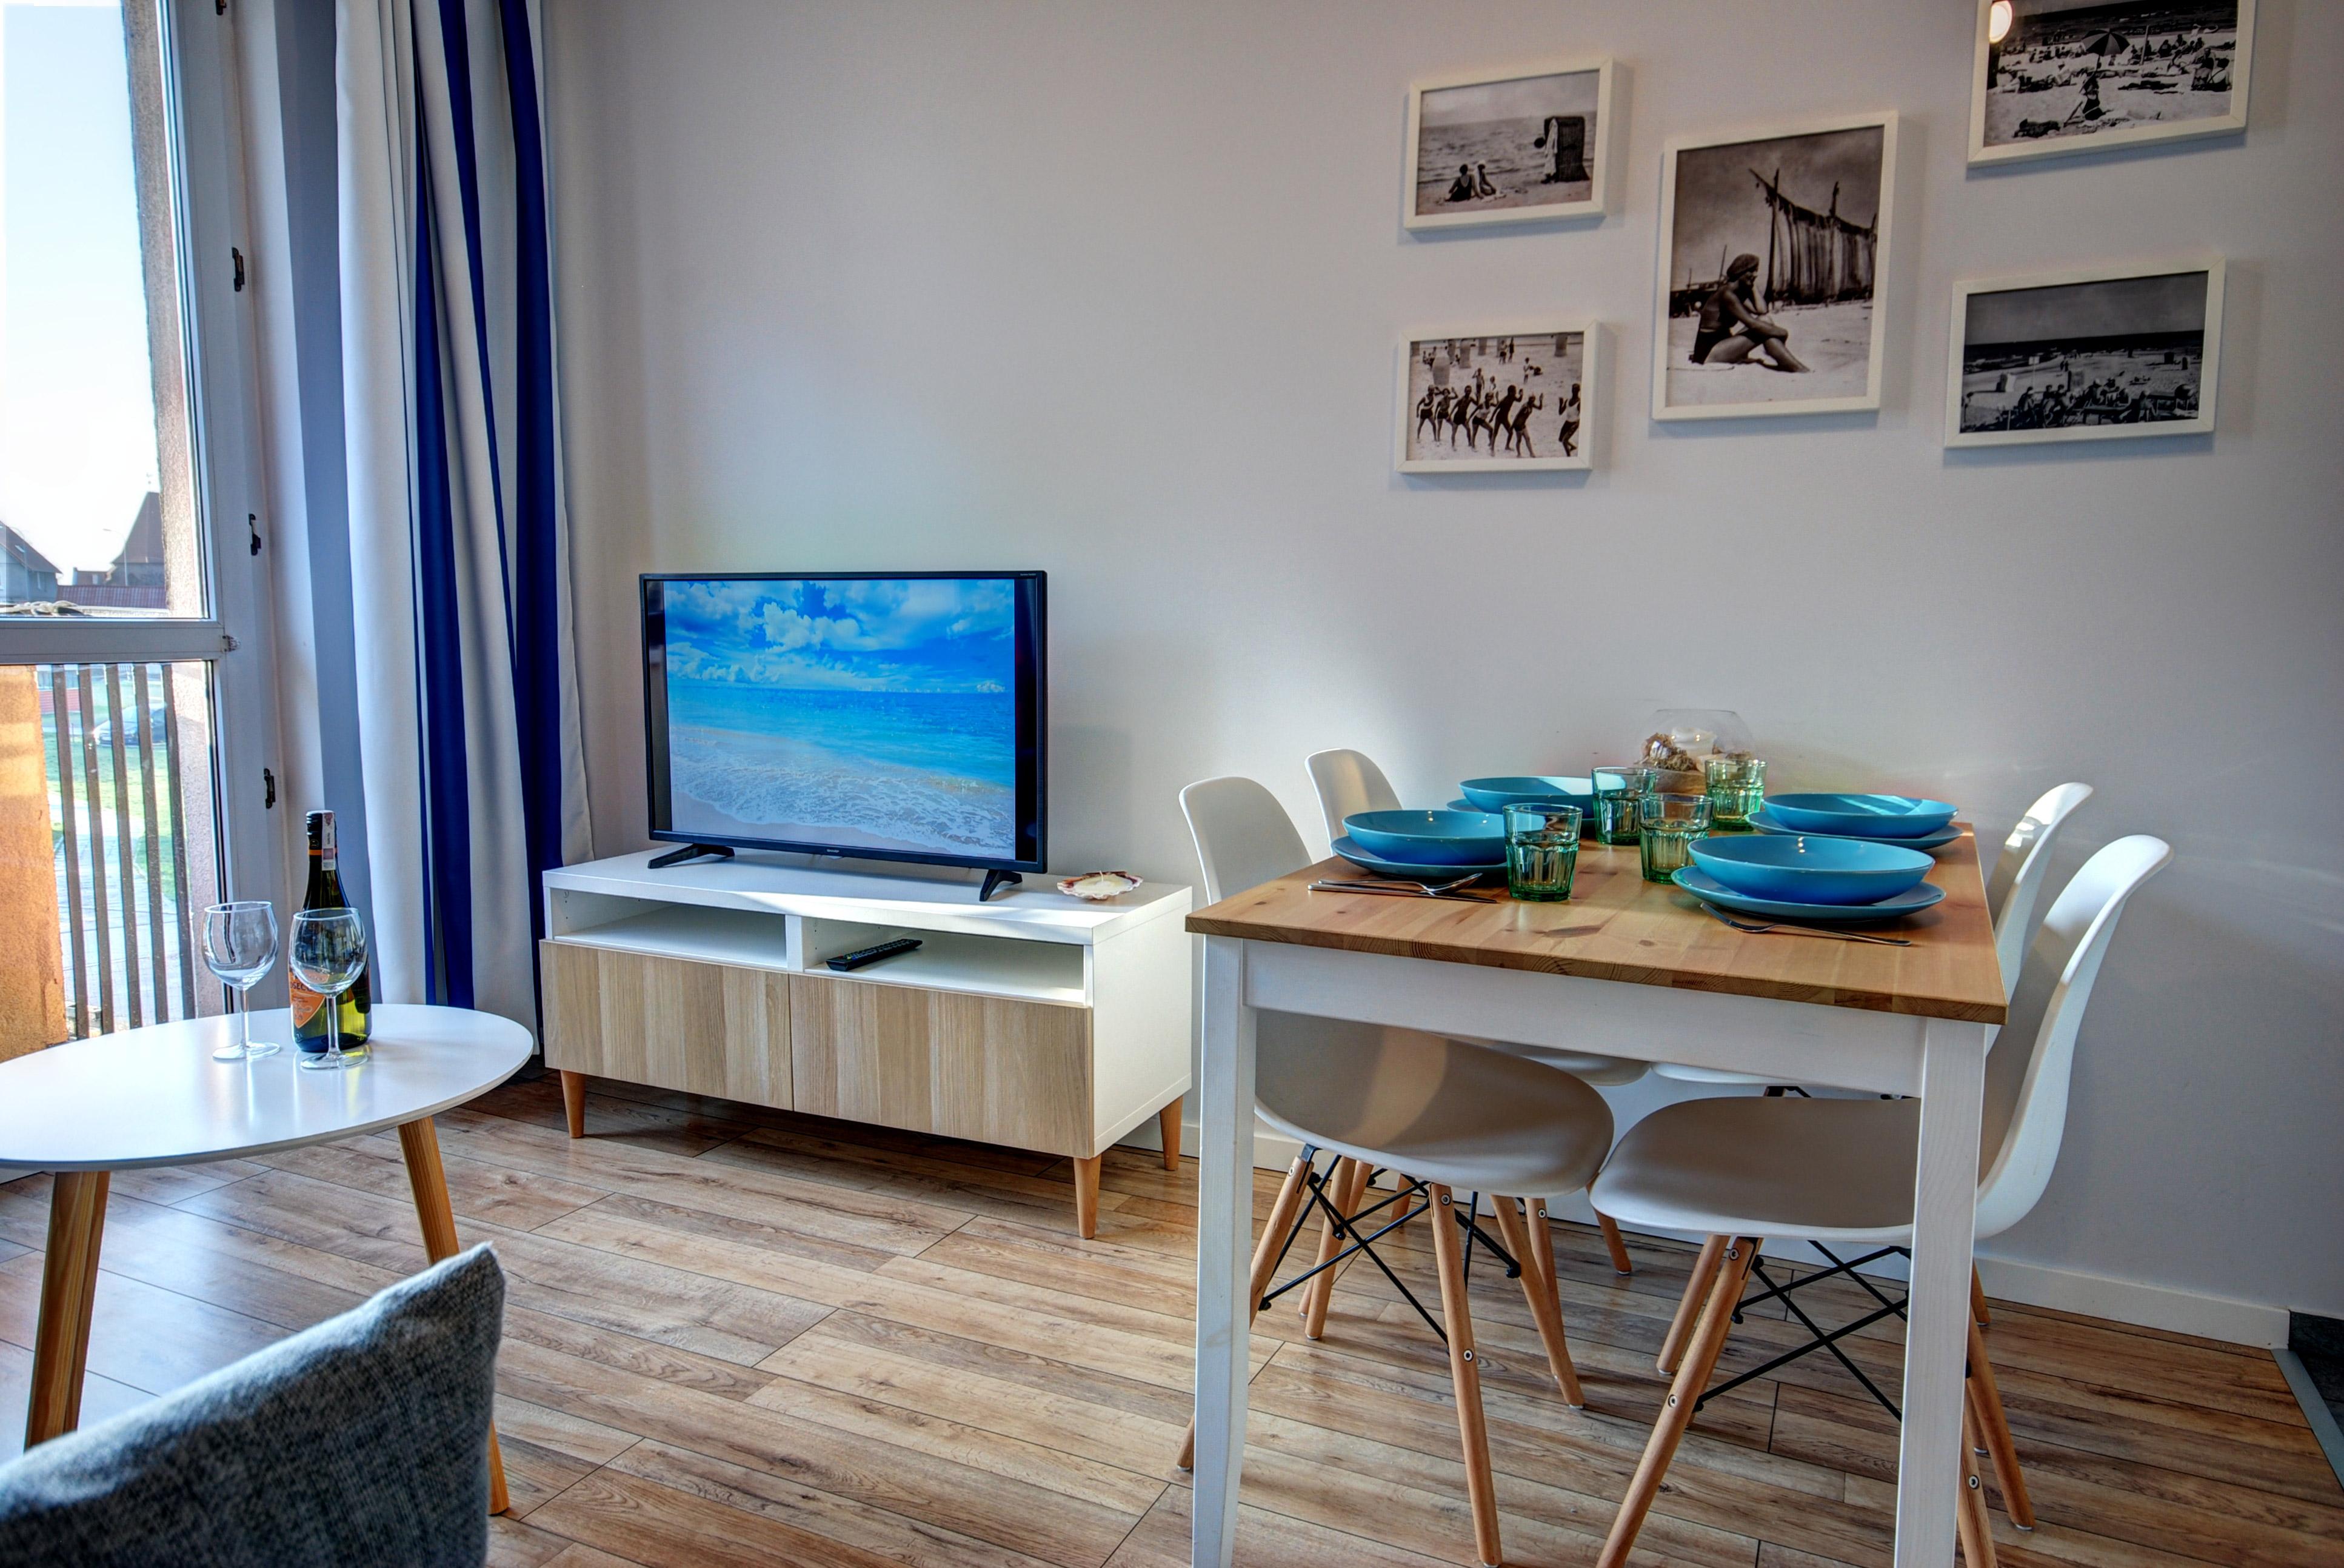 Apartament Bałtyk II